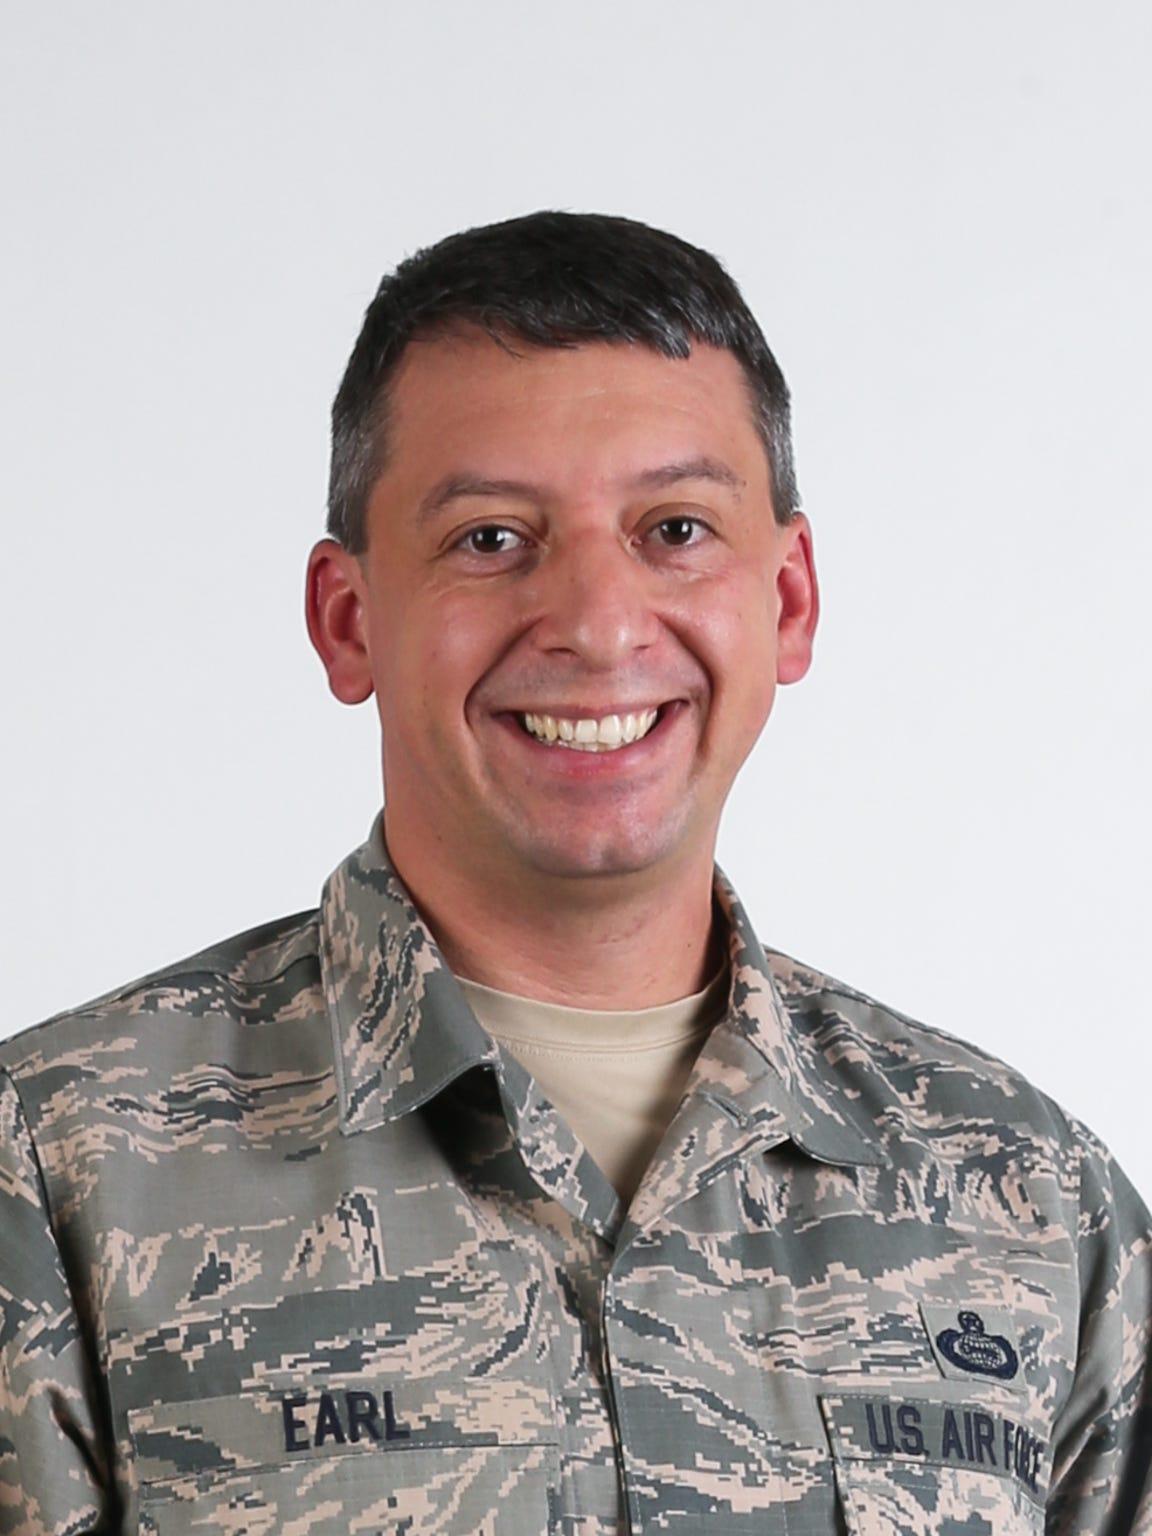 Douglas Earl, Operations superintendent at Goodfellow